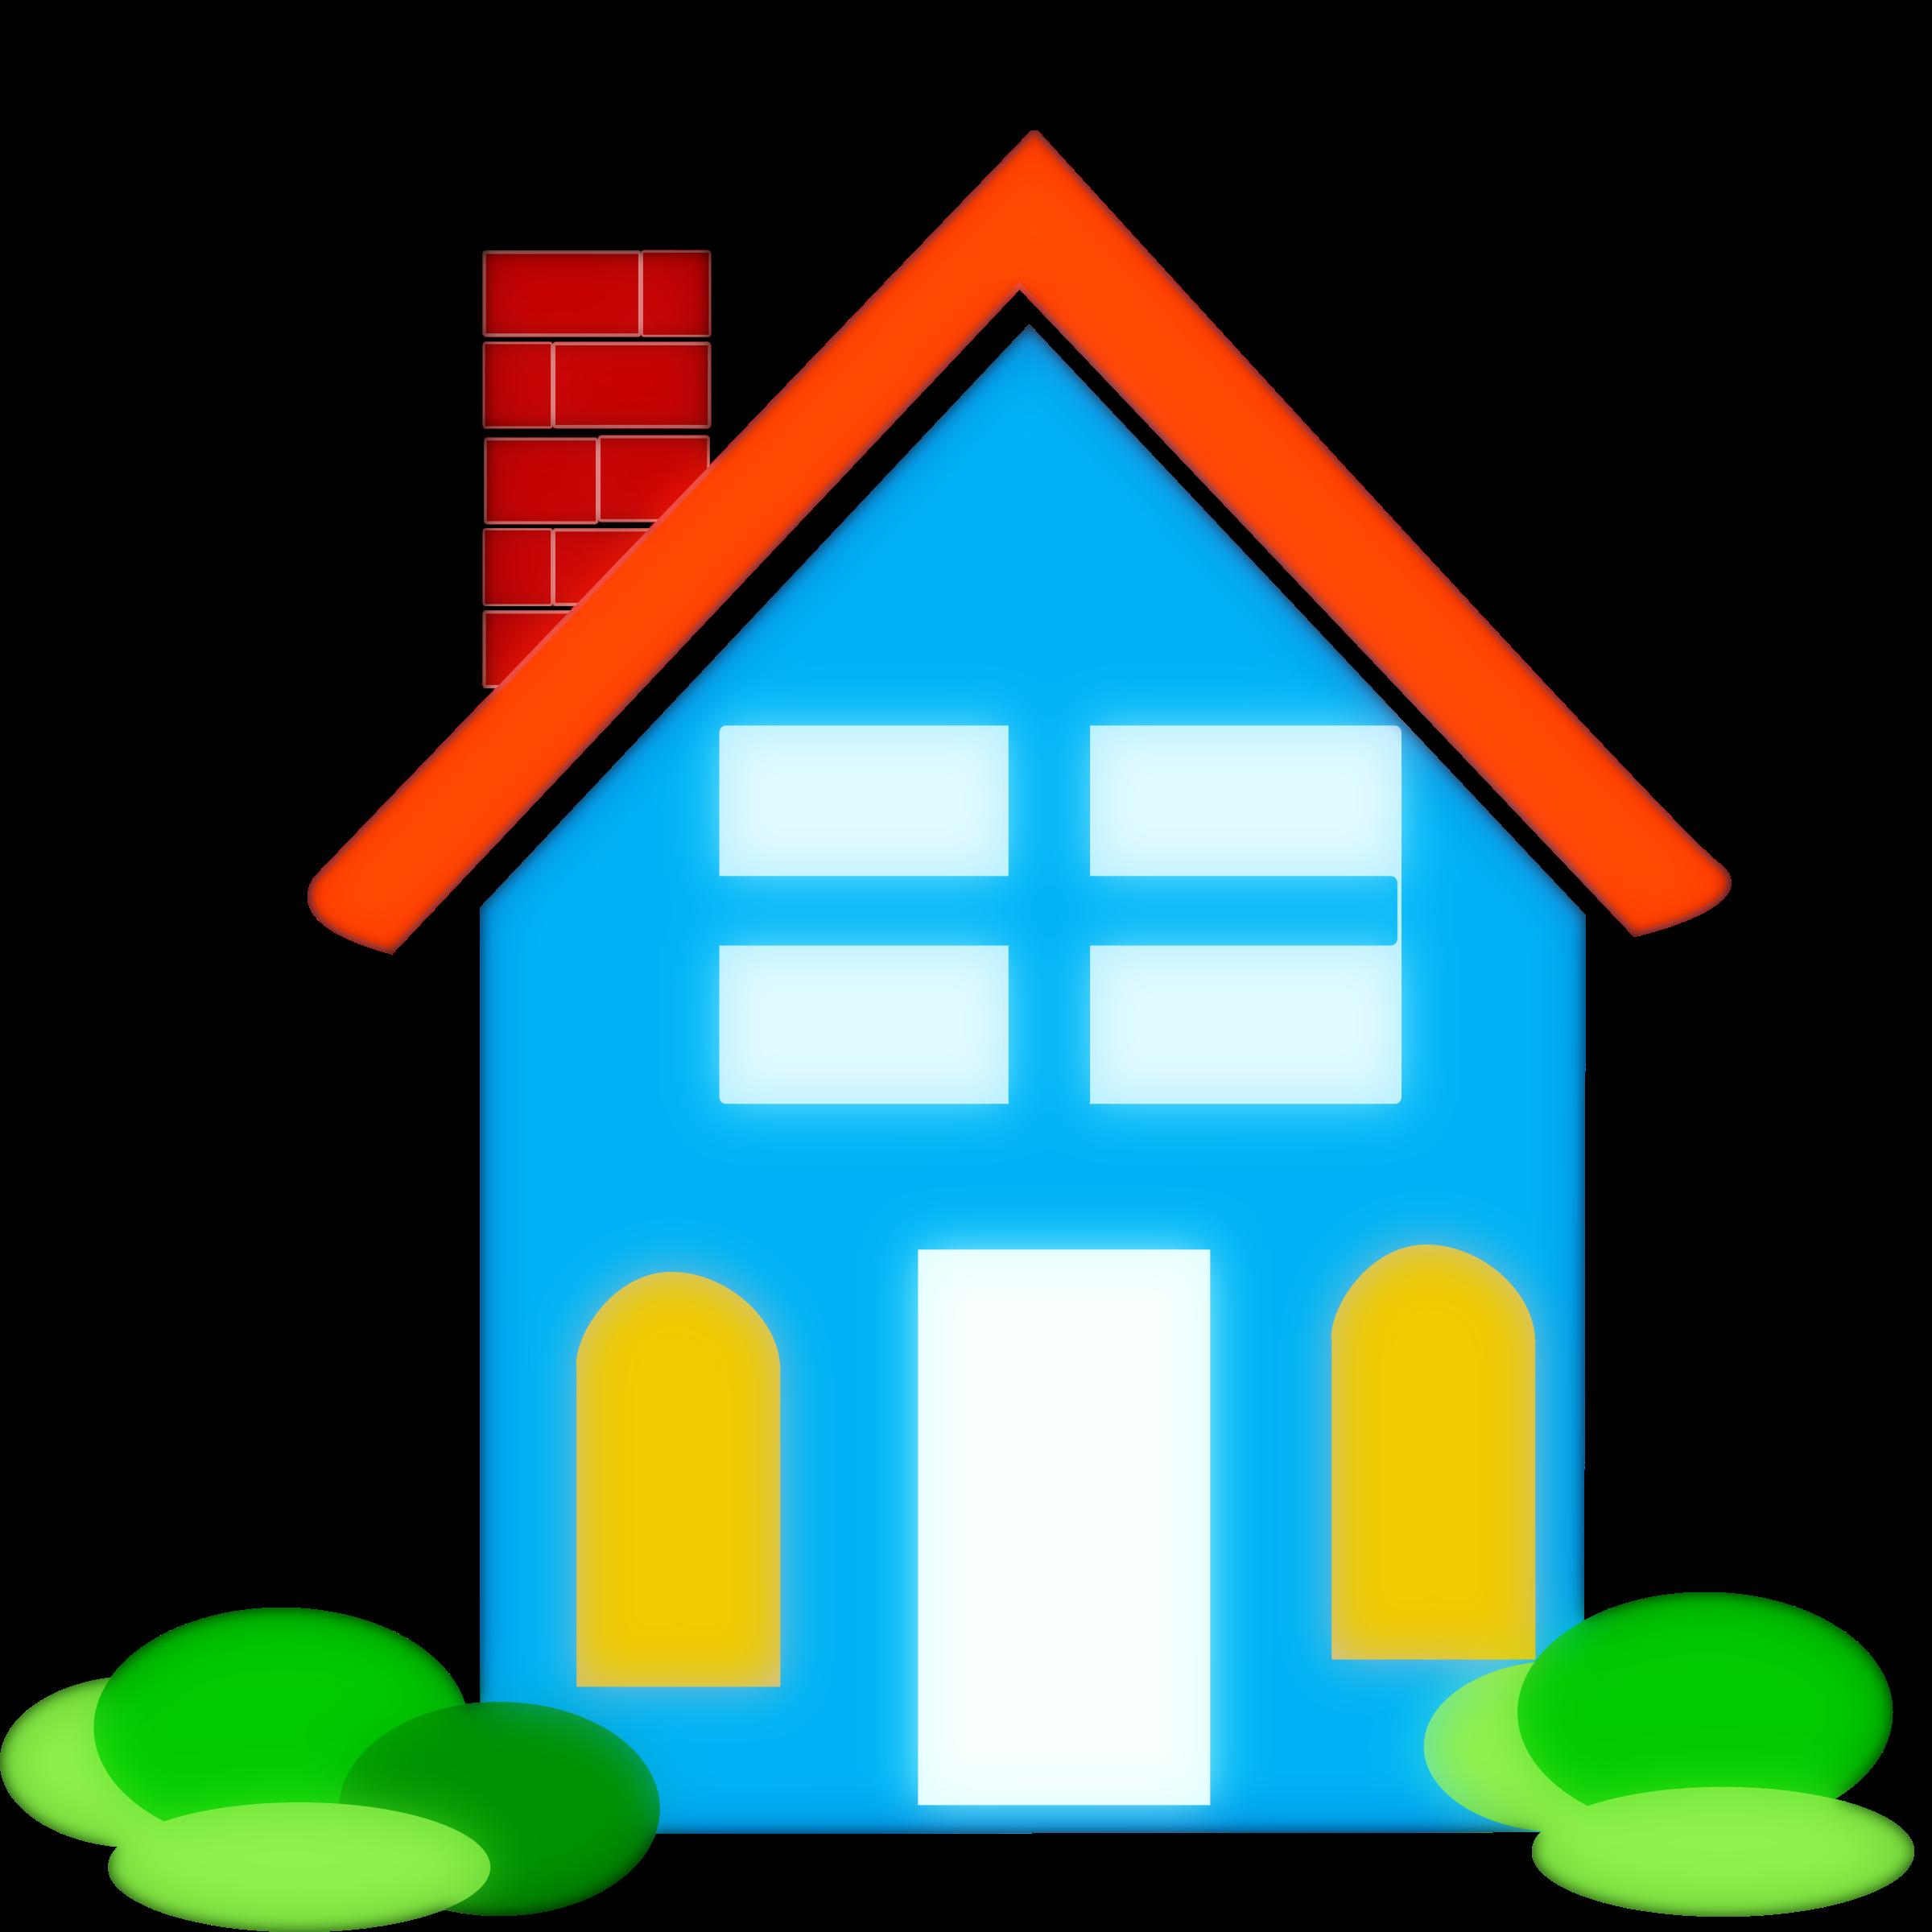 Hosue clipart vector Home clipart Clipart home clipart